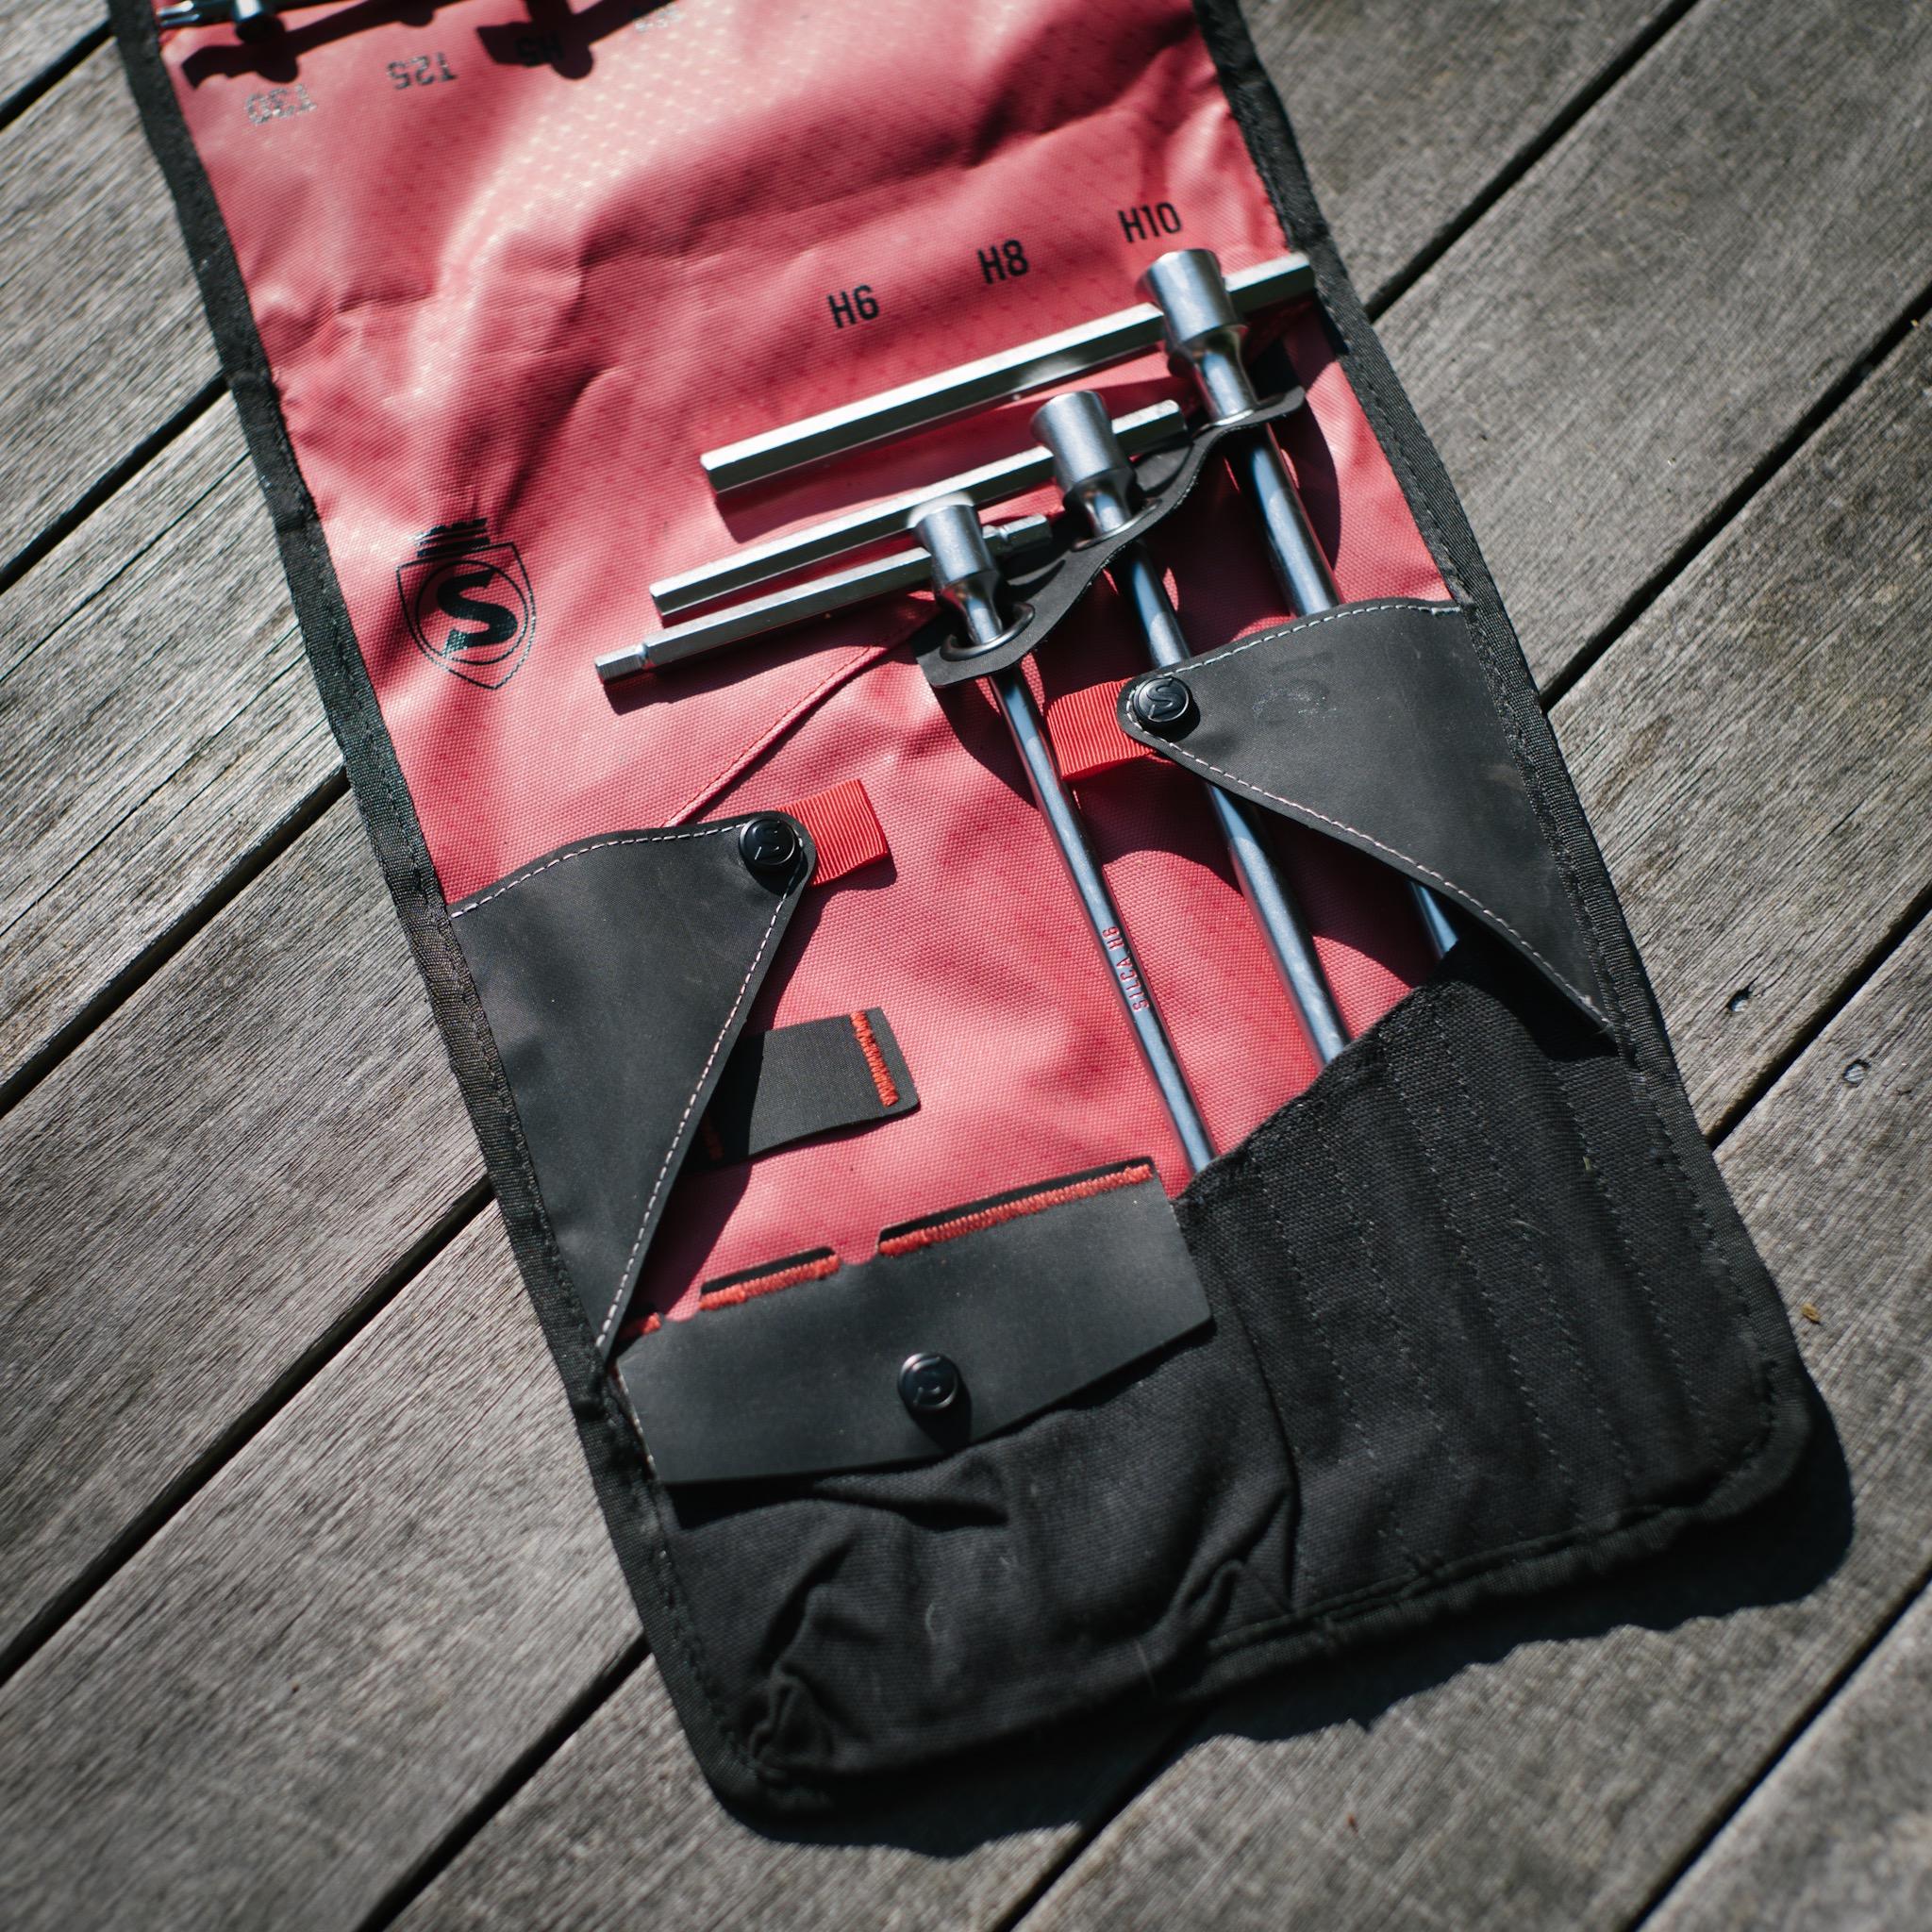 silca-t-handle-folio-review-hex-toolset-3